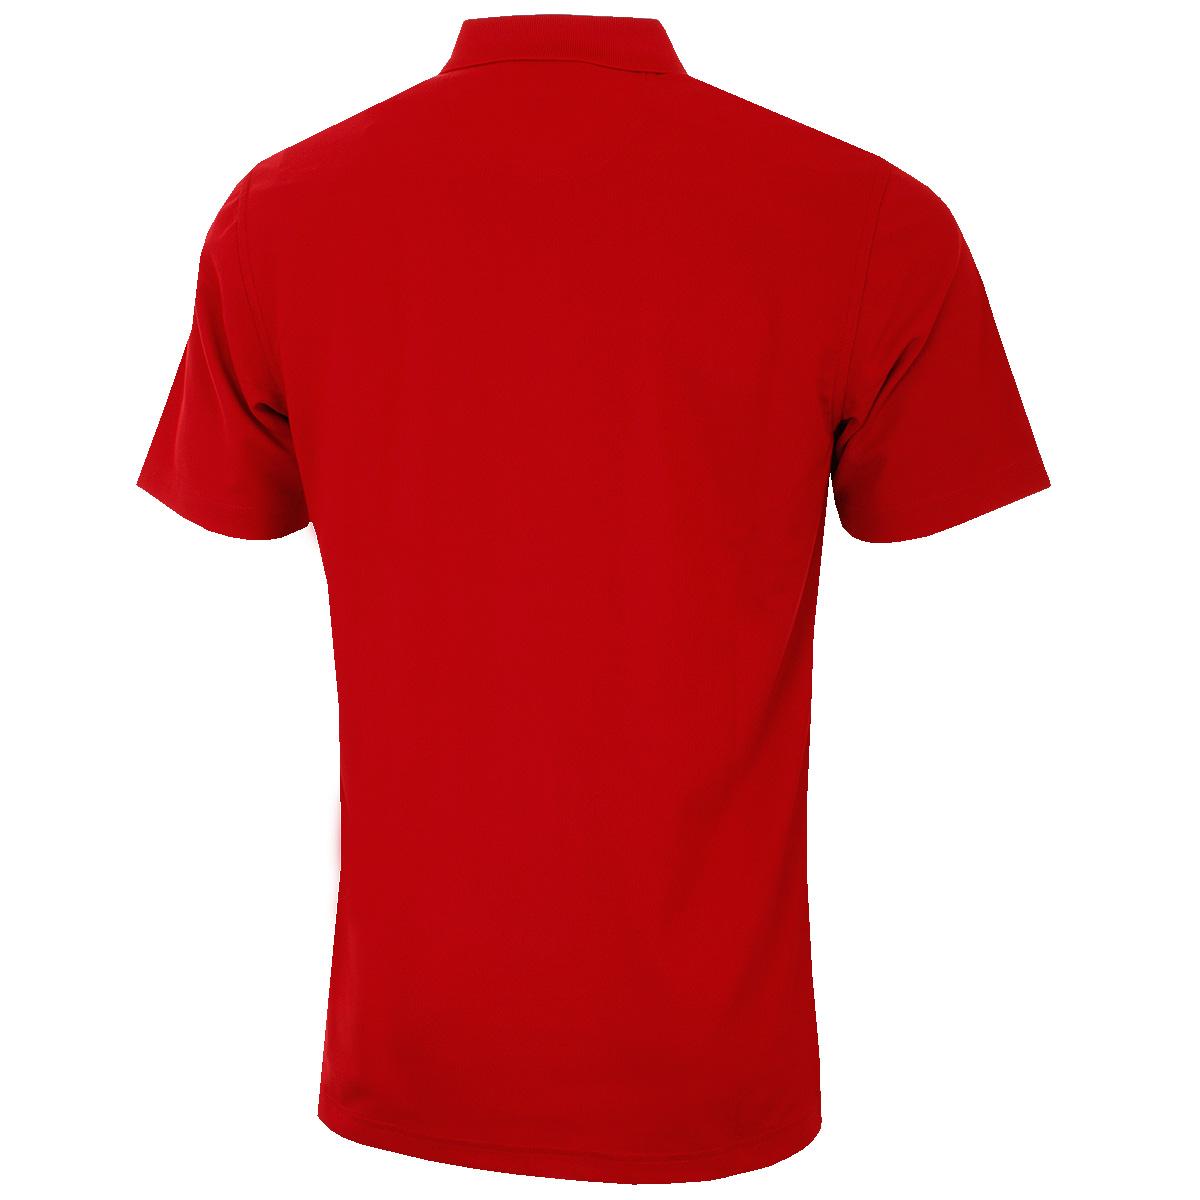 Greg-Norman-Mens-KX04-Performance-Micro-Pique-Golf-Polo-Shirt-28-OFF-RRP thumbnail 19